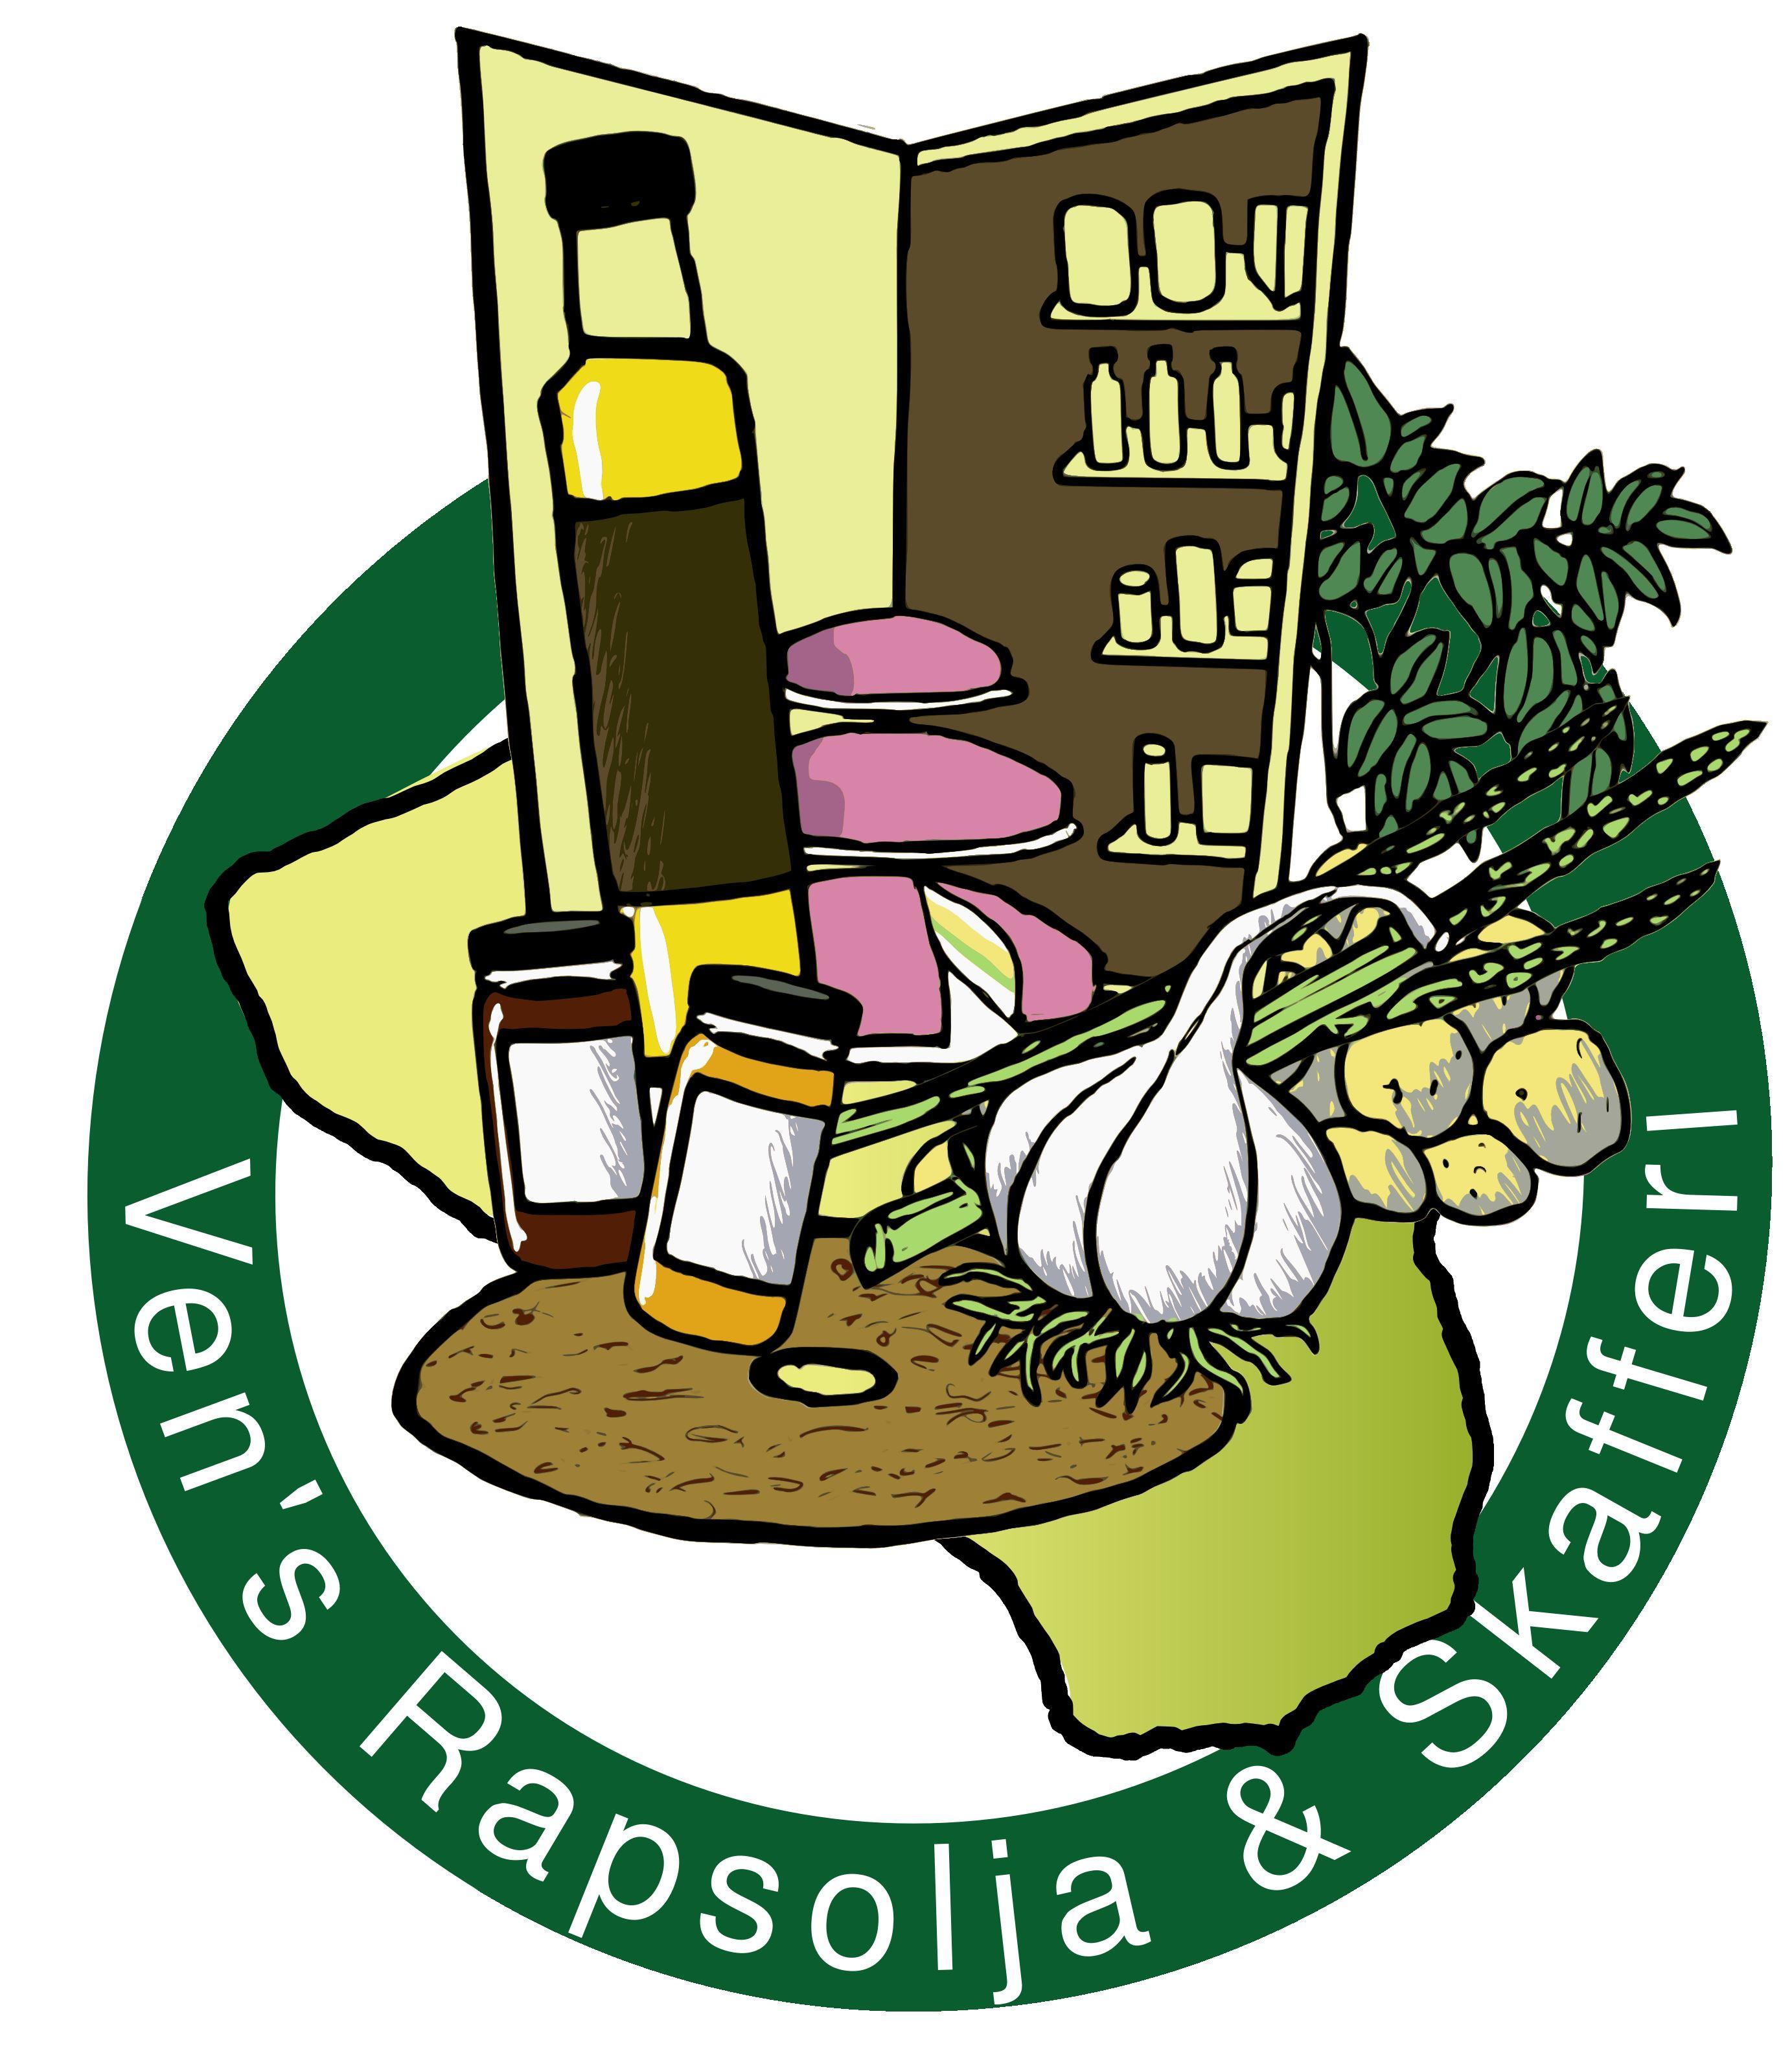 Vens Rapsolja & Skafferi